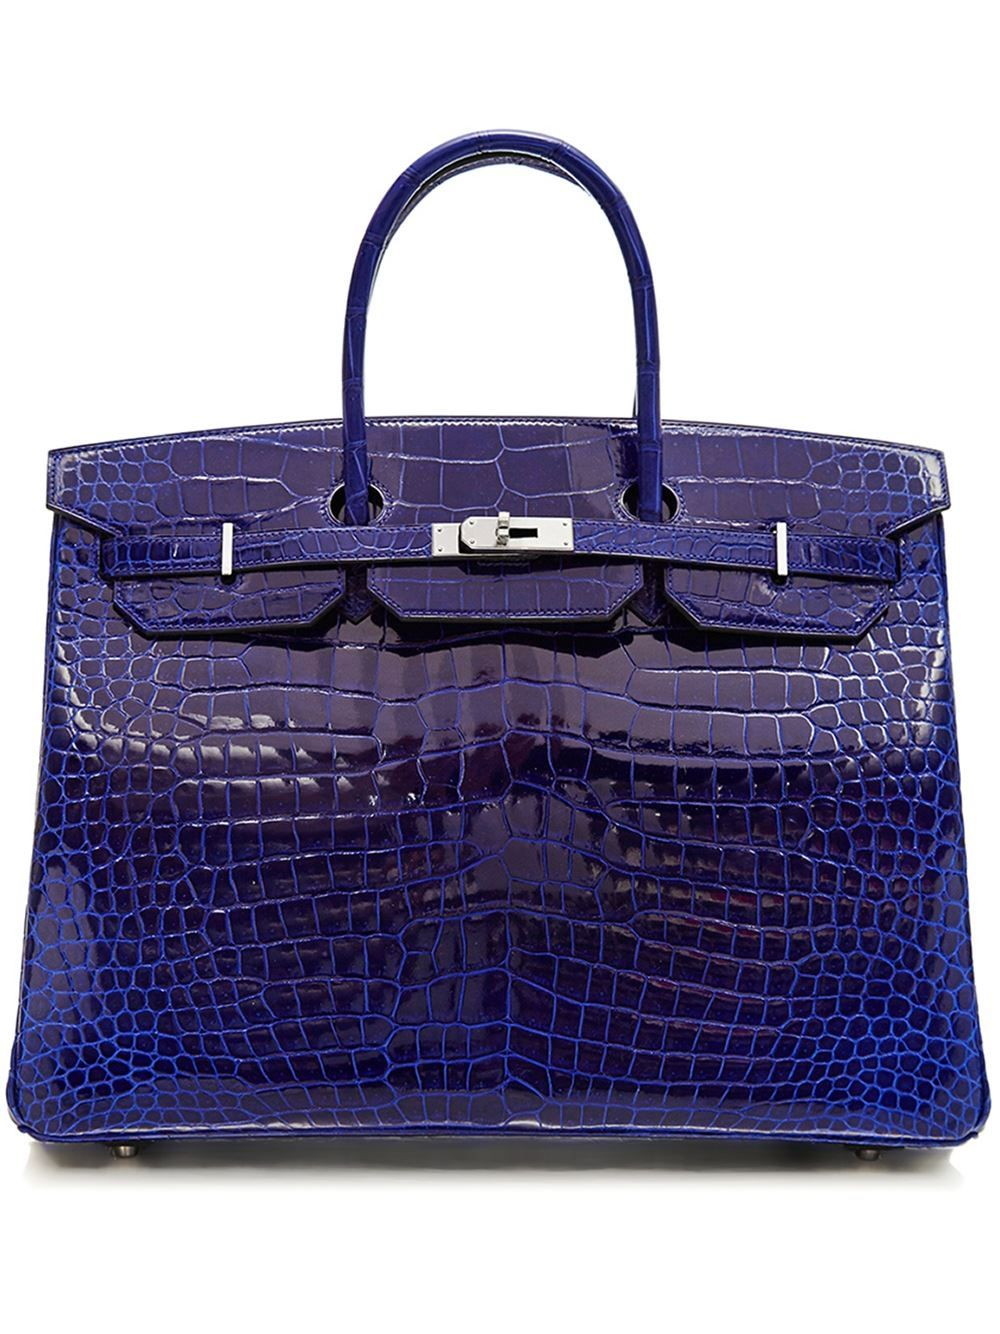 Herms Vintage 40cm Birkin Handtasche Rewind Affairs Nucelle Women Leather Purse Satchel Shoulder Bag Handbag Lock Gorgeous Glitter Elegant Blue Farfetchcom